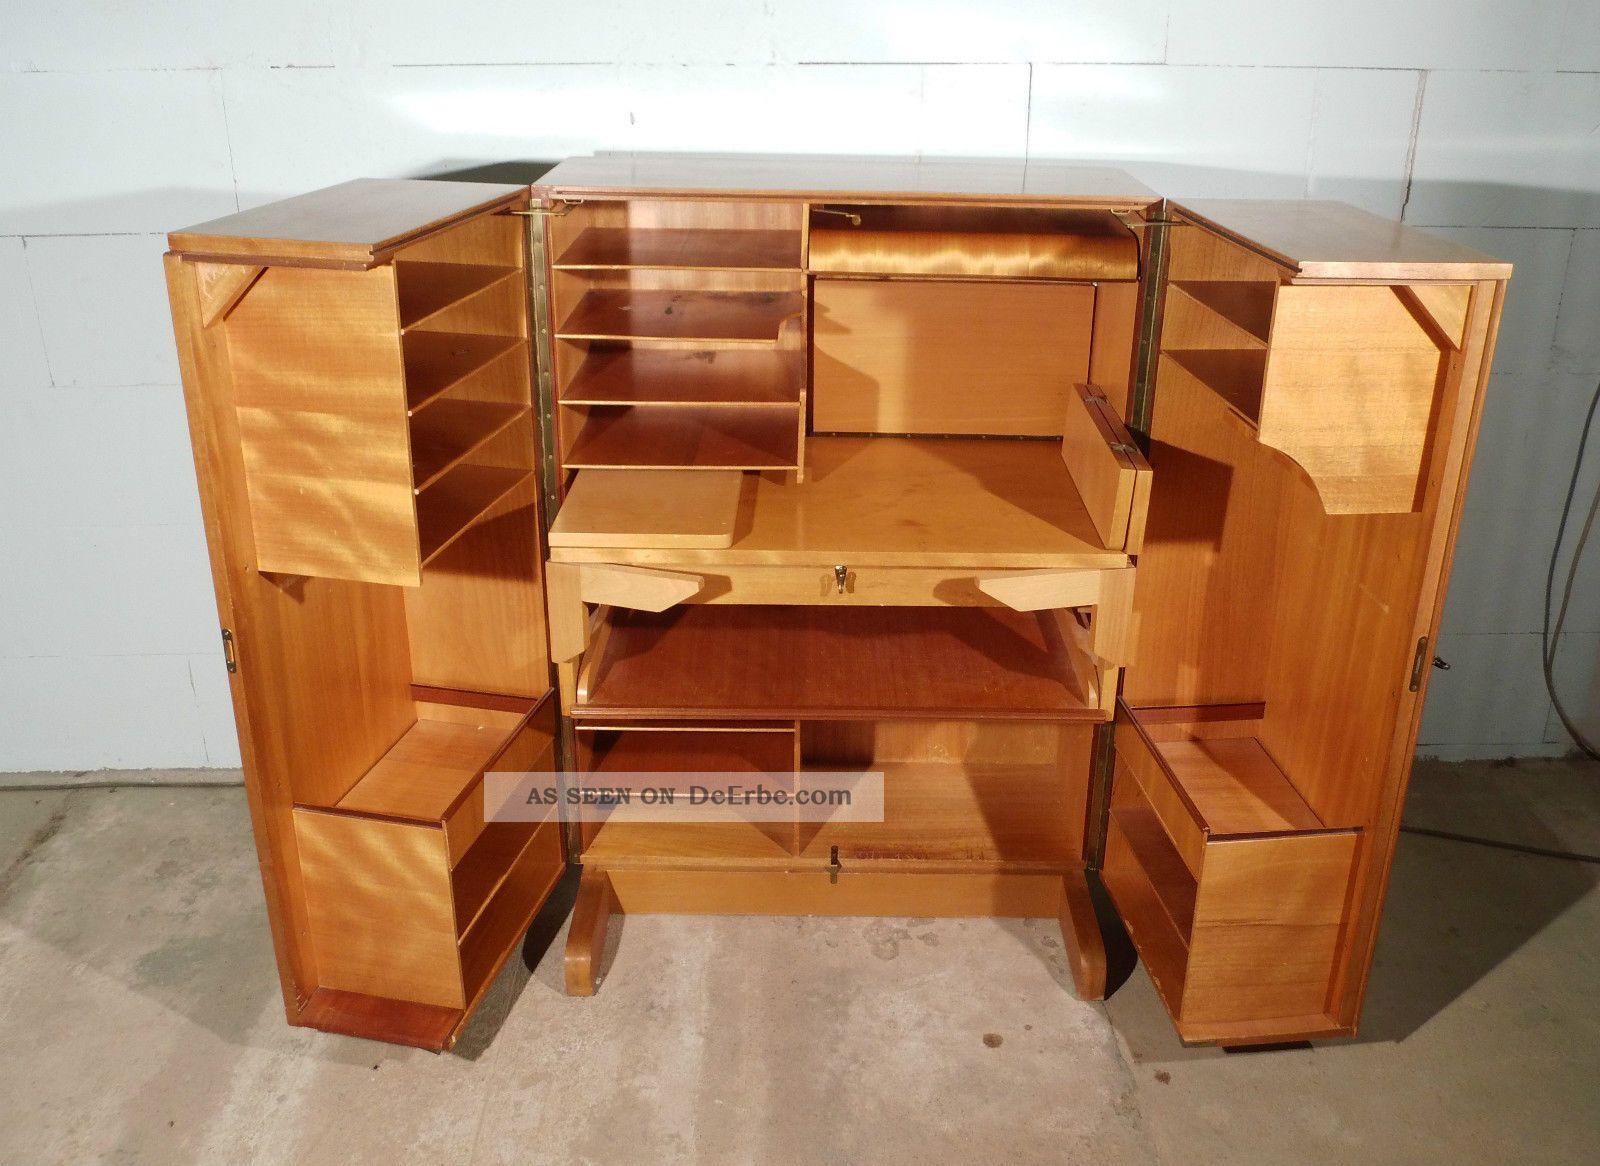 hausb ro kubus raumwunder sekret r nussbaum furniert 50er bauhaus design rarit t. Black Bedroom Furniture Sets. Home Design Ideas